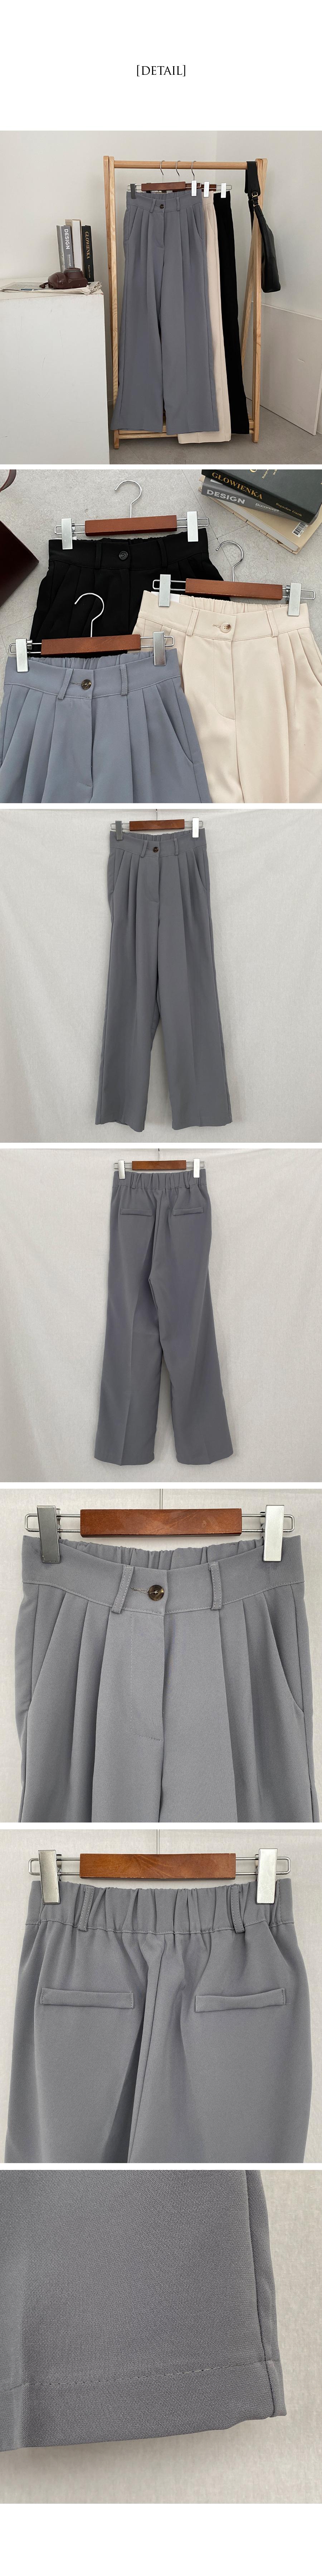 Diago rear banding pintuck wide slacks